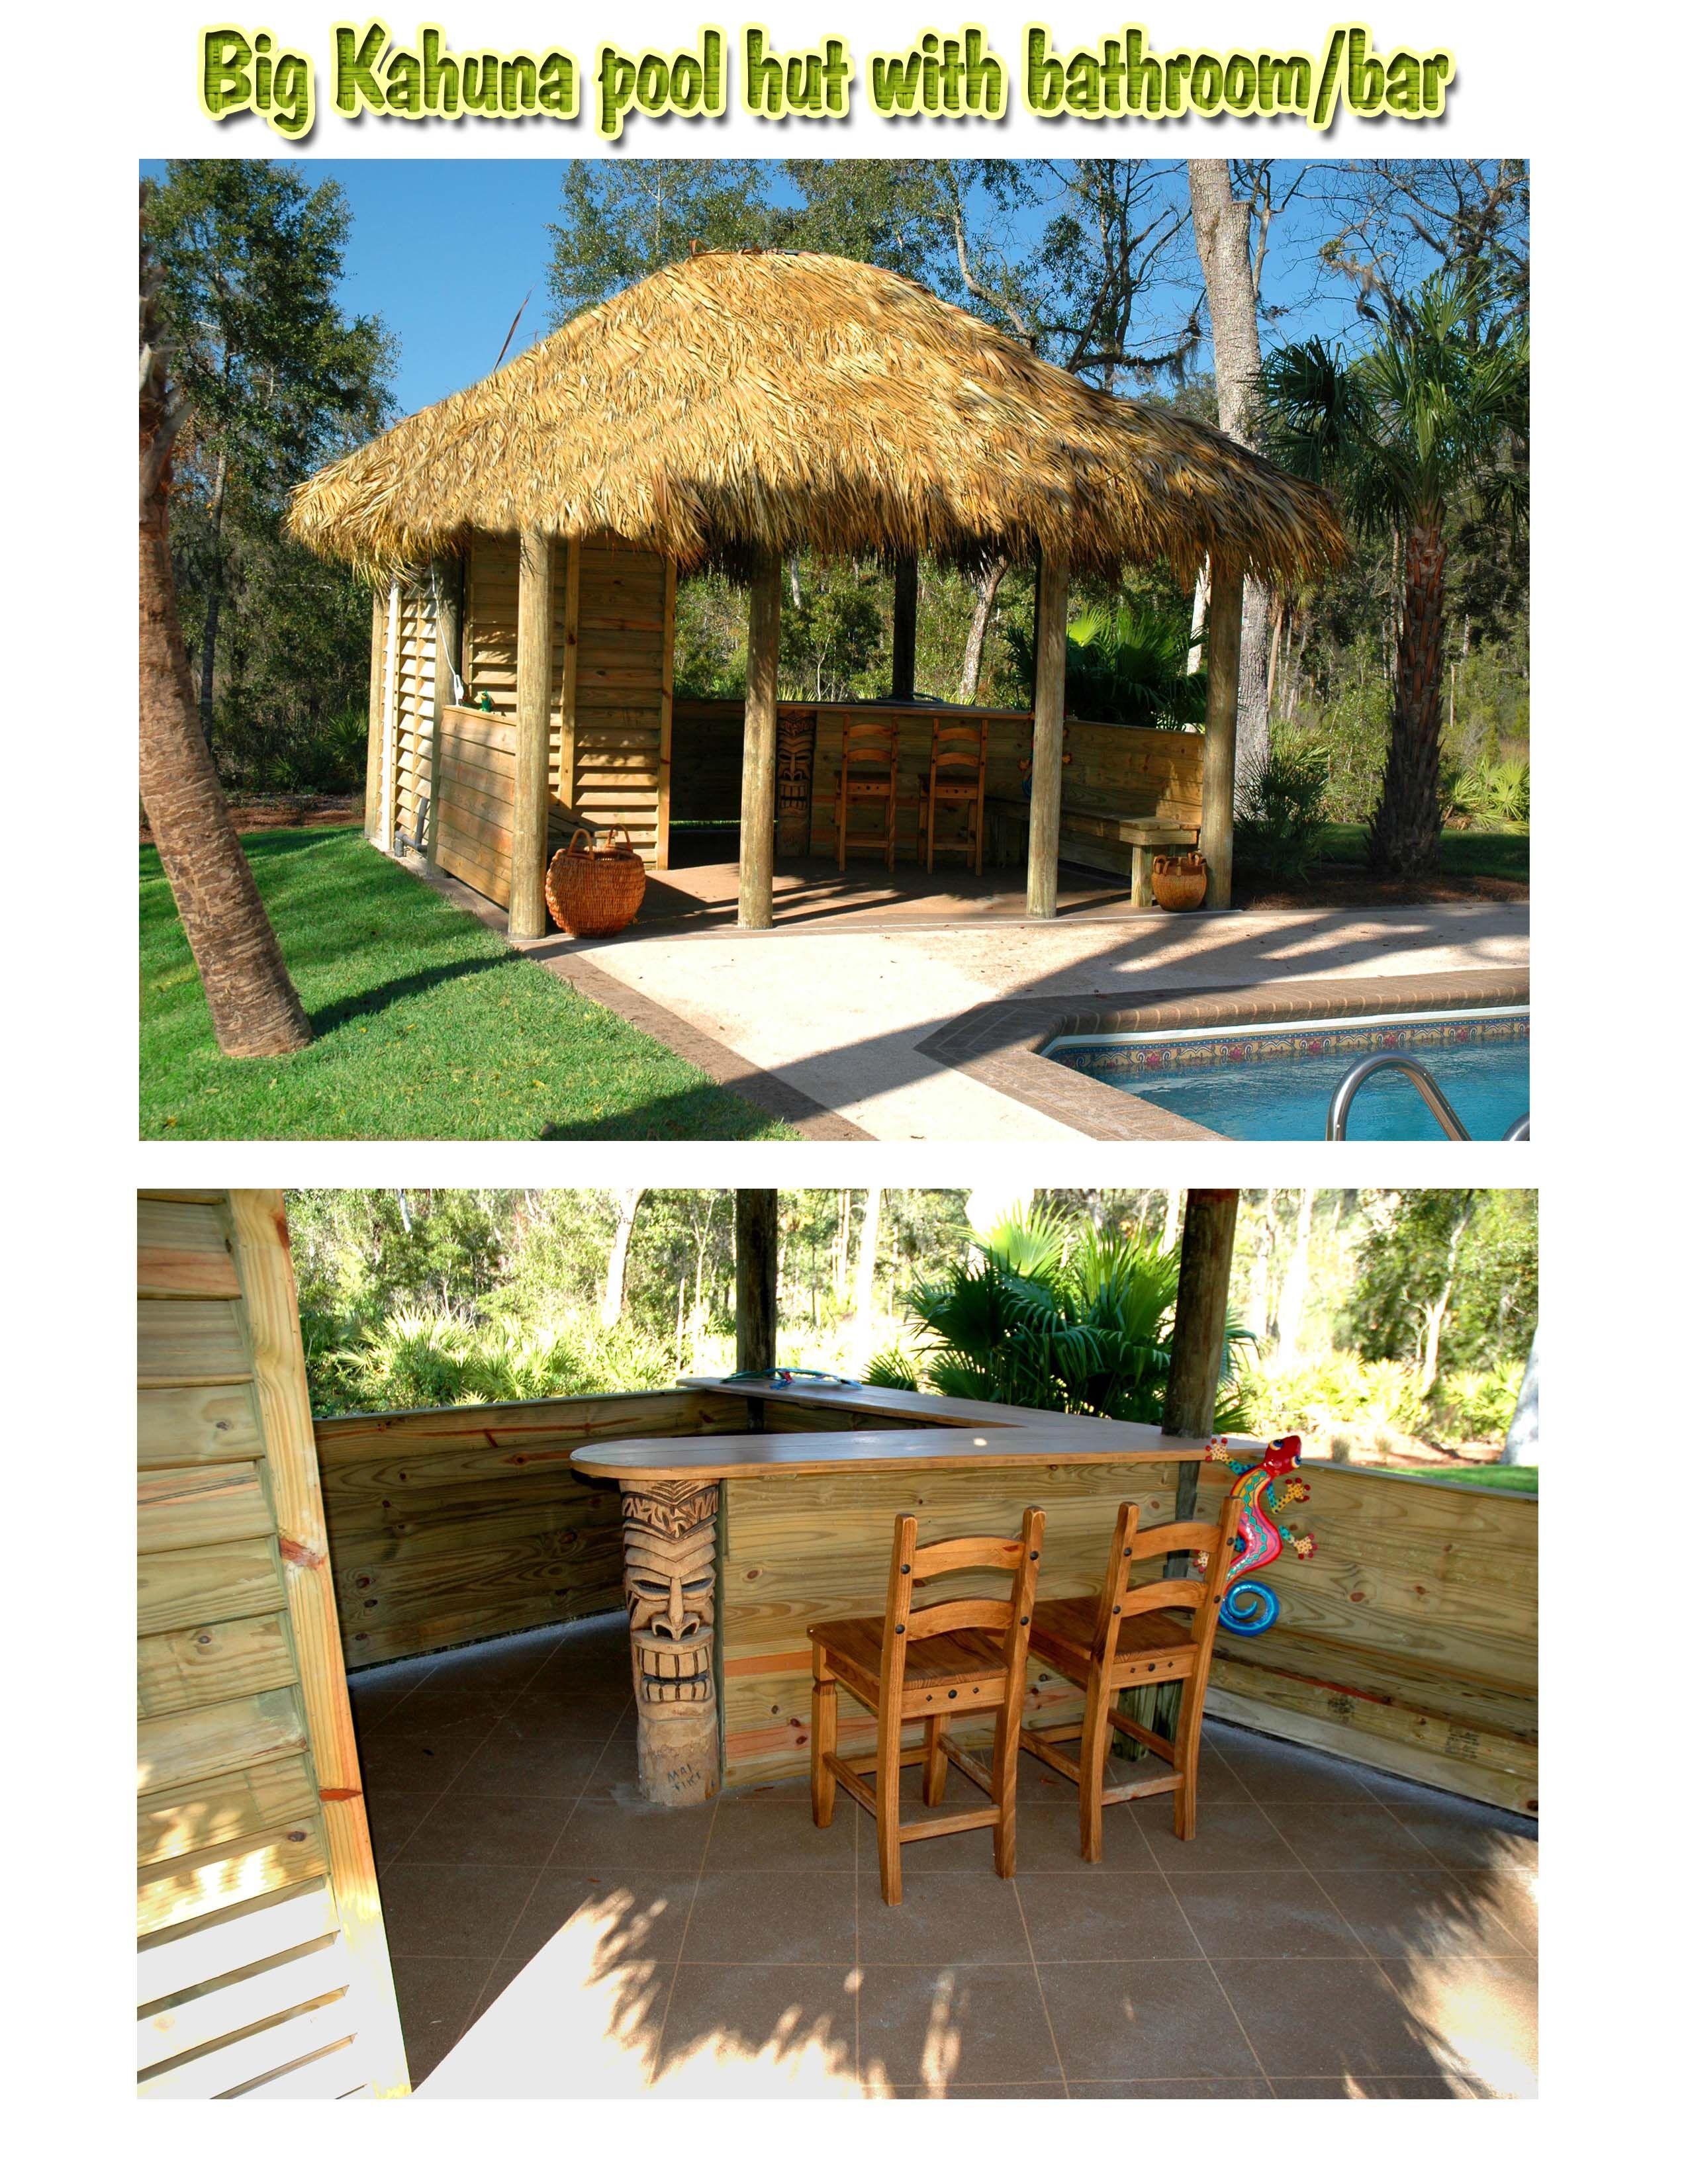 I really need a Tiki hut | Tiki hut, Backyard patio ...